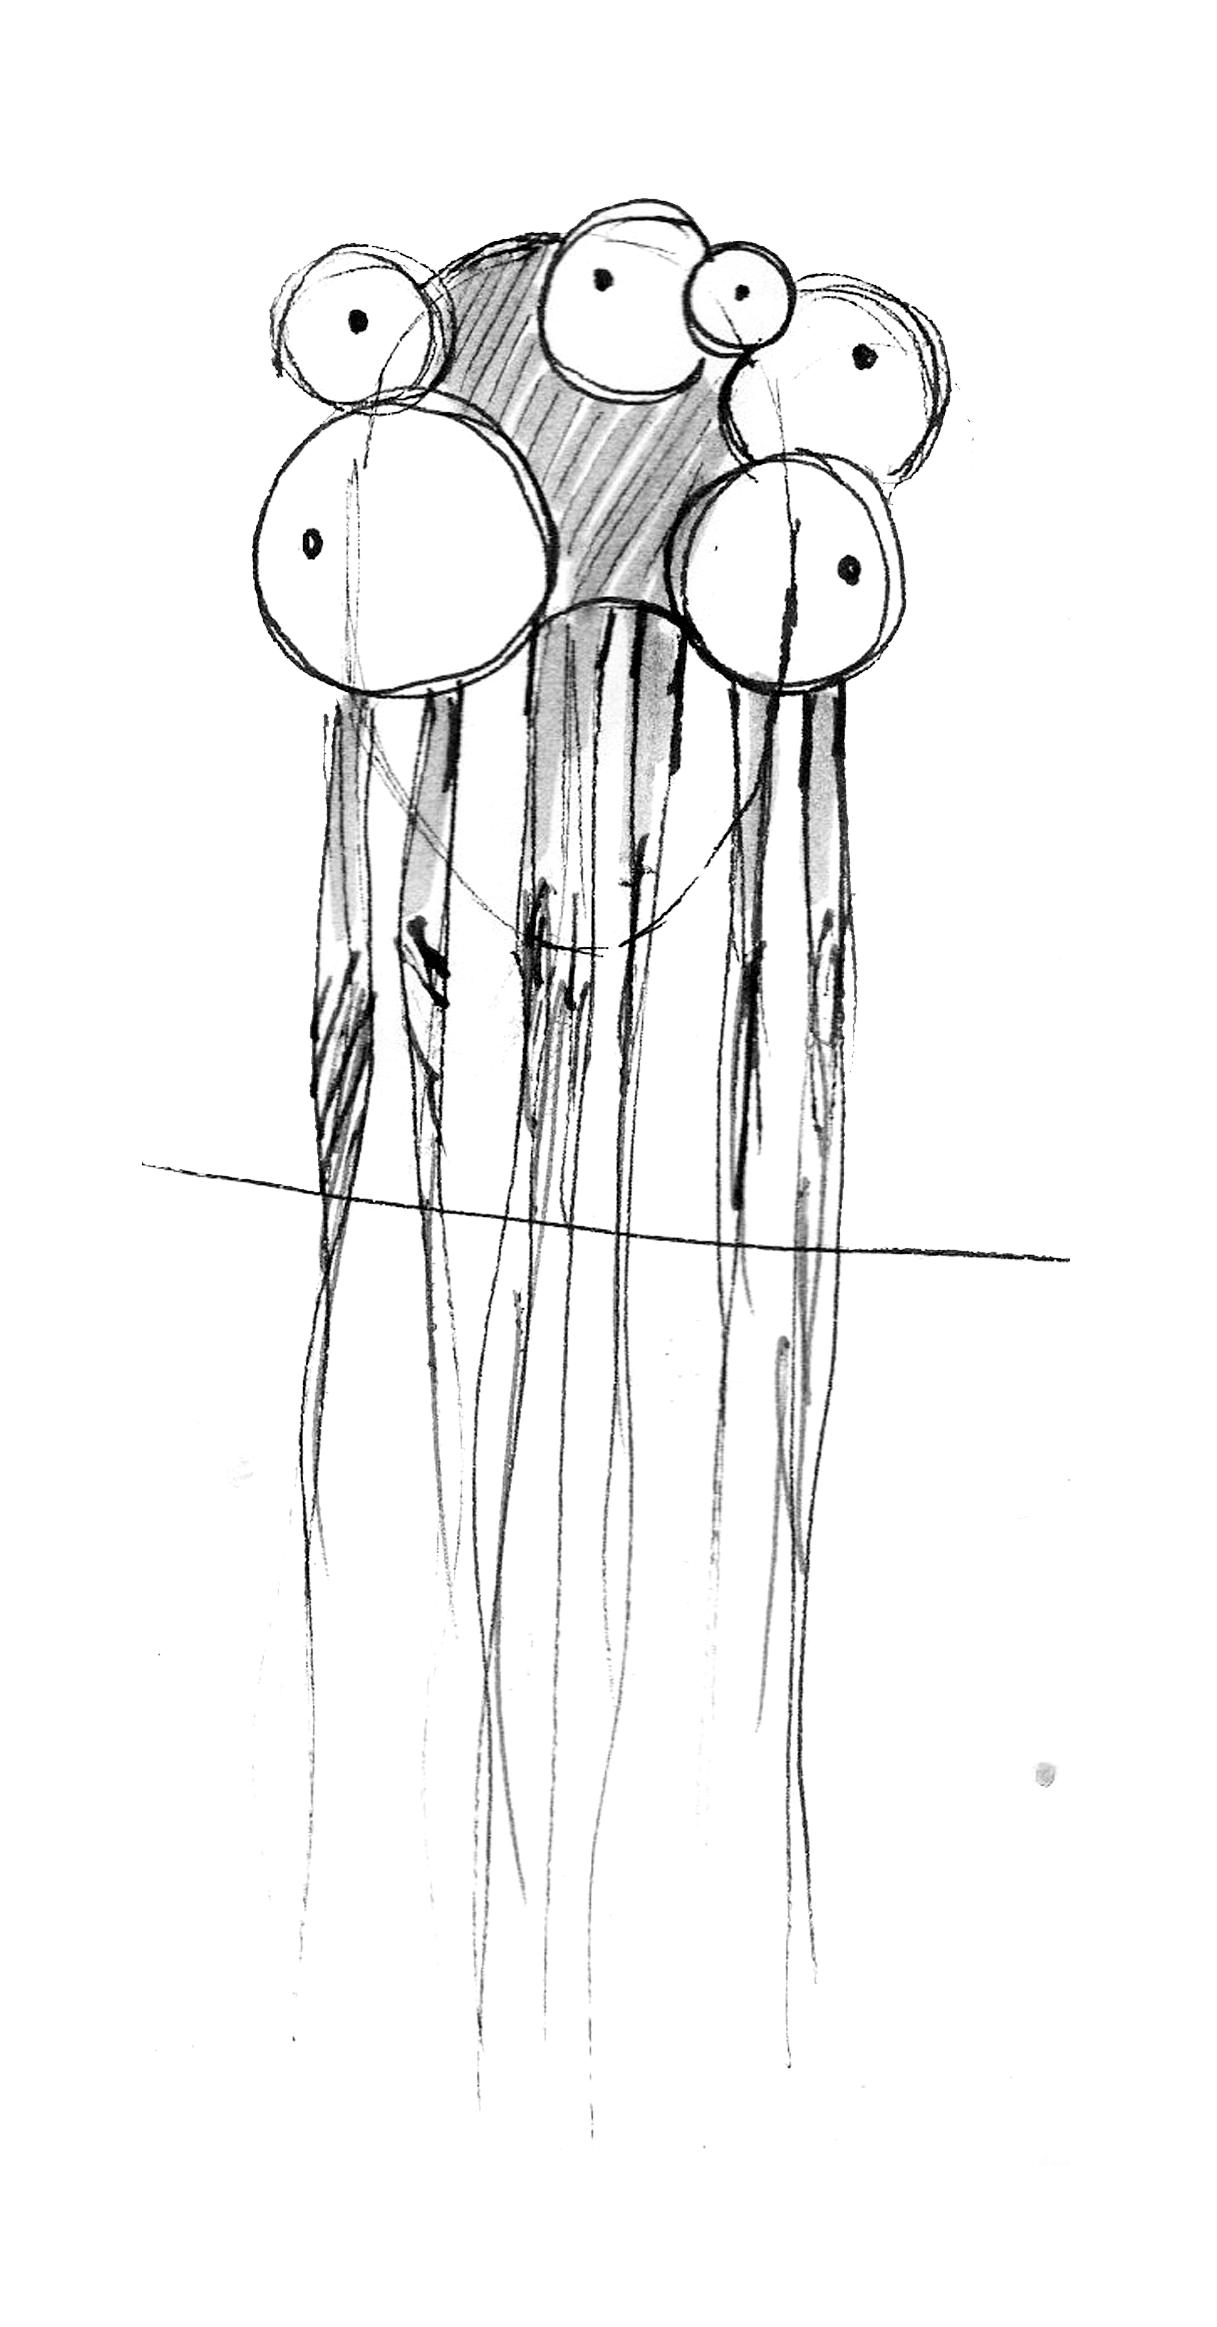 Freaks, weird fashion mask by Marion Parfait. (drawing).  http://cargocollective.com/marionparfait https://www.facebook.com/marion.parfait.1?refid=17&_ft_=app_id.2309869772 http://issuu.com/marionparfait